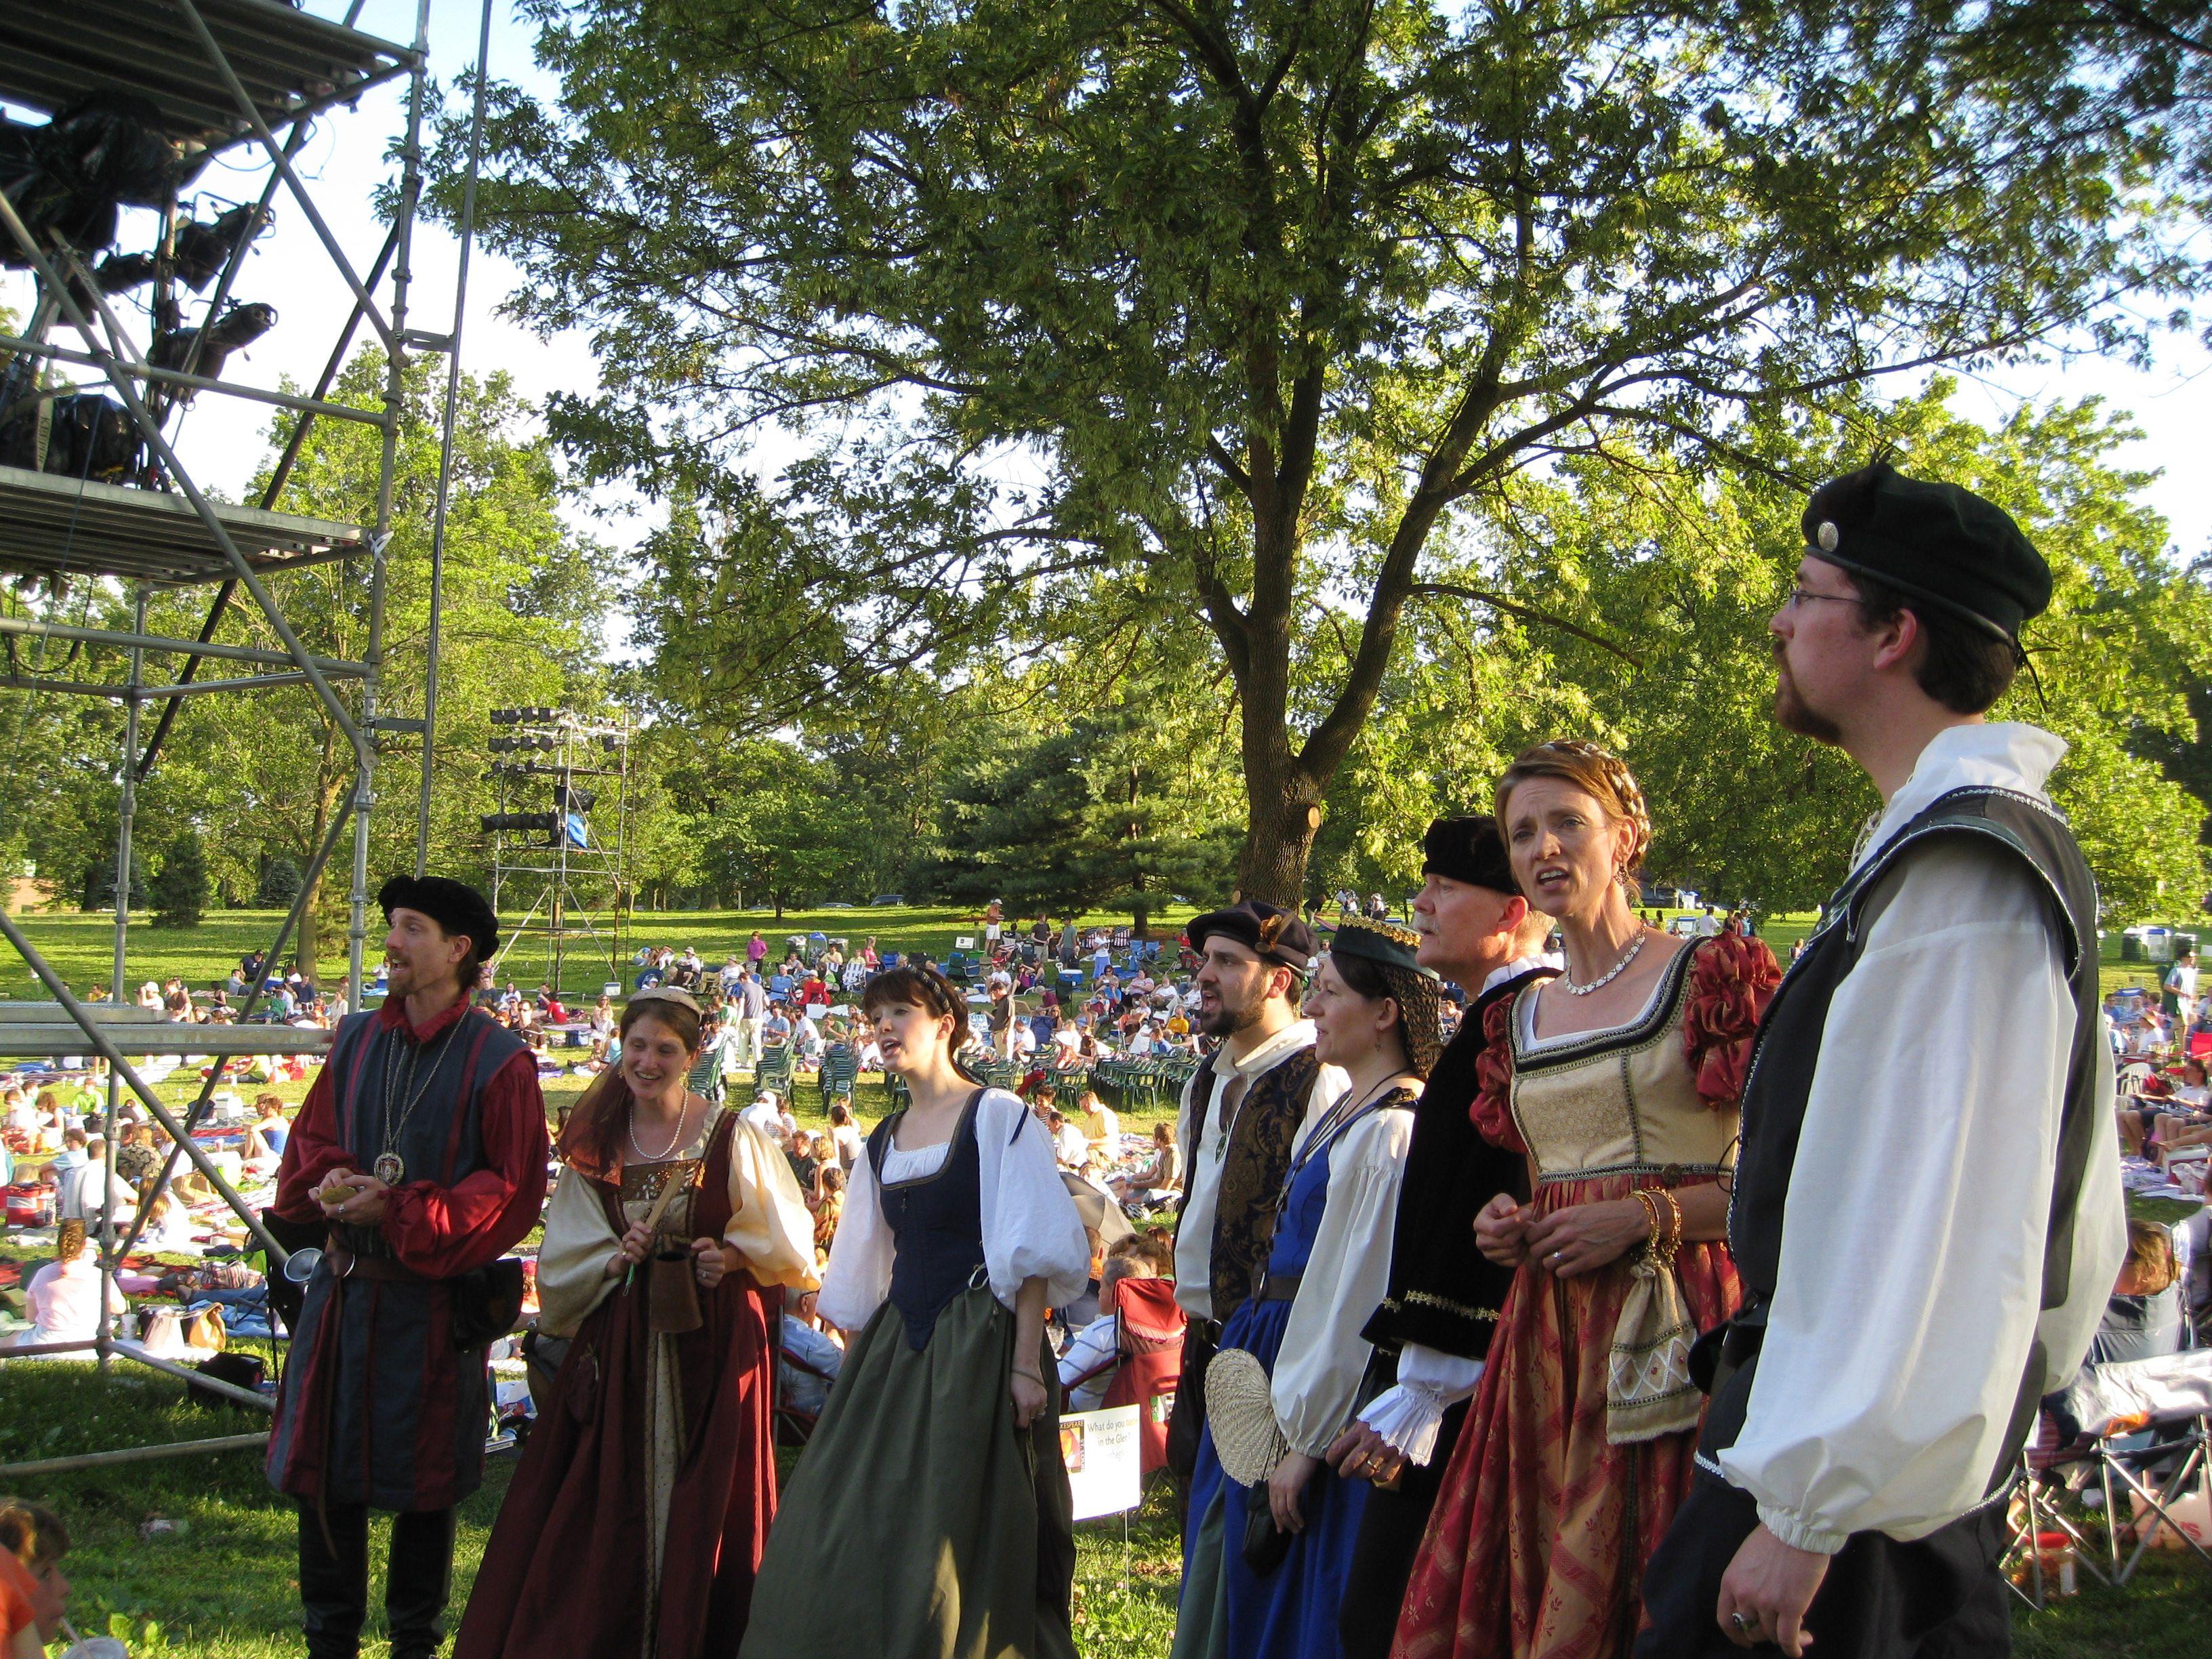 O Brien Auto Park >> Free Fun in the Summer: Shakespeare Festival St. Louis